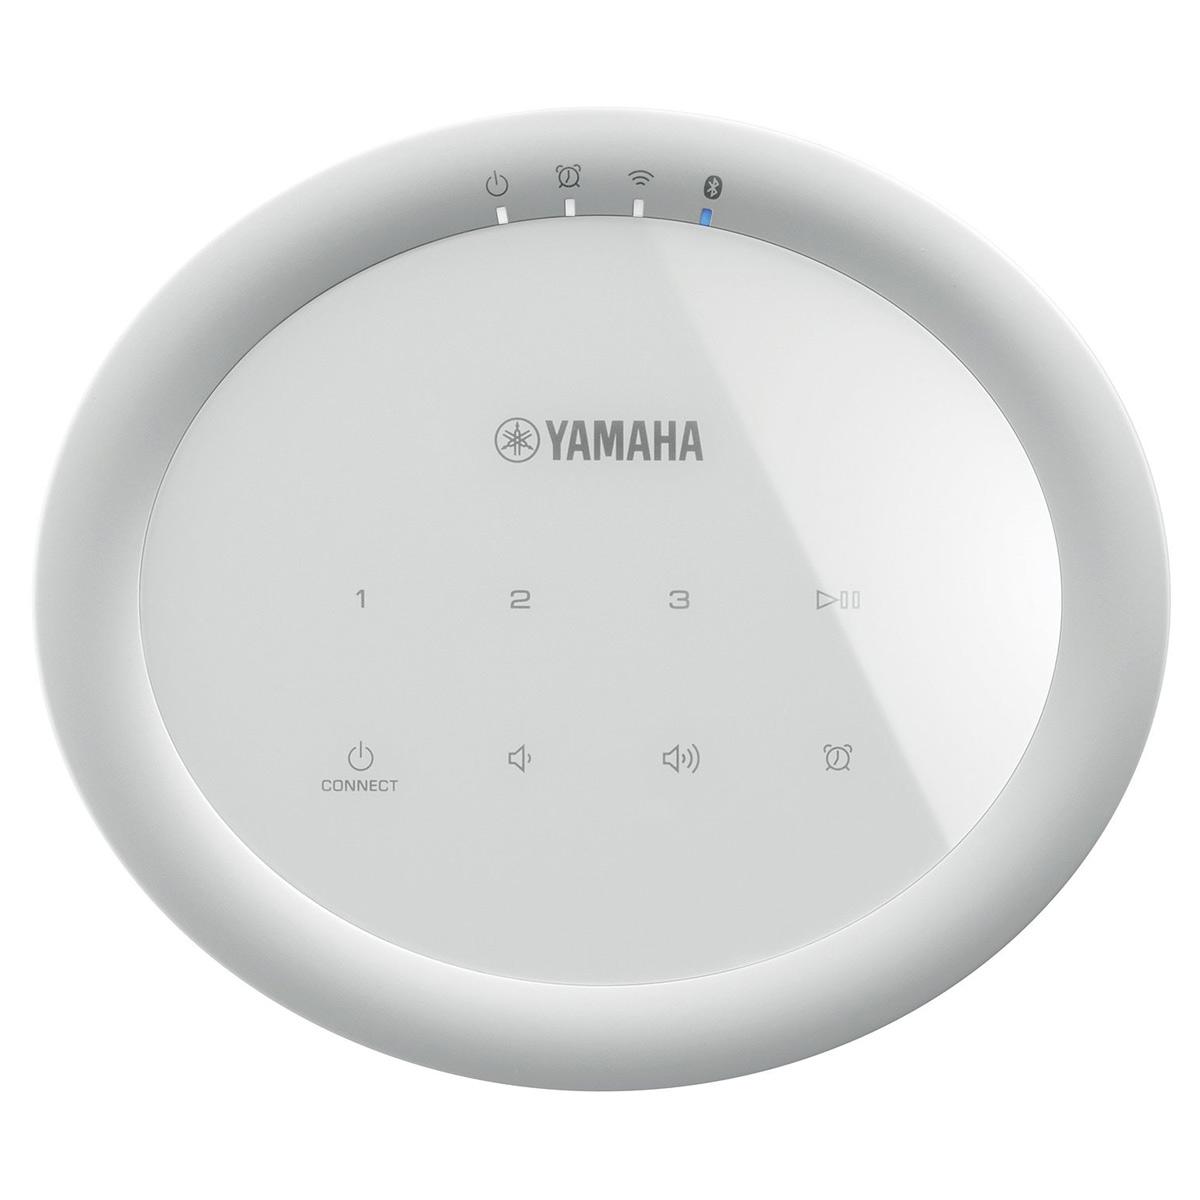 Yamaha WX-021 MusicCast 20 Wireless Speaker